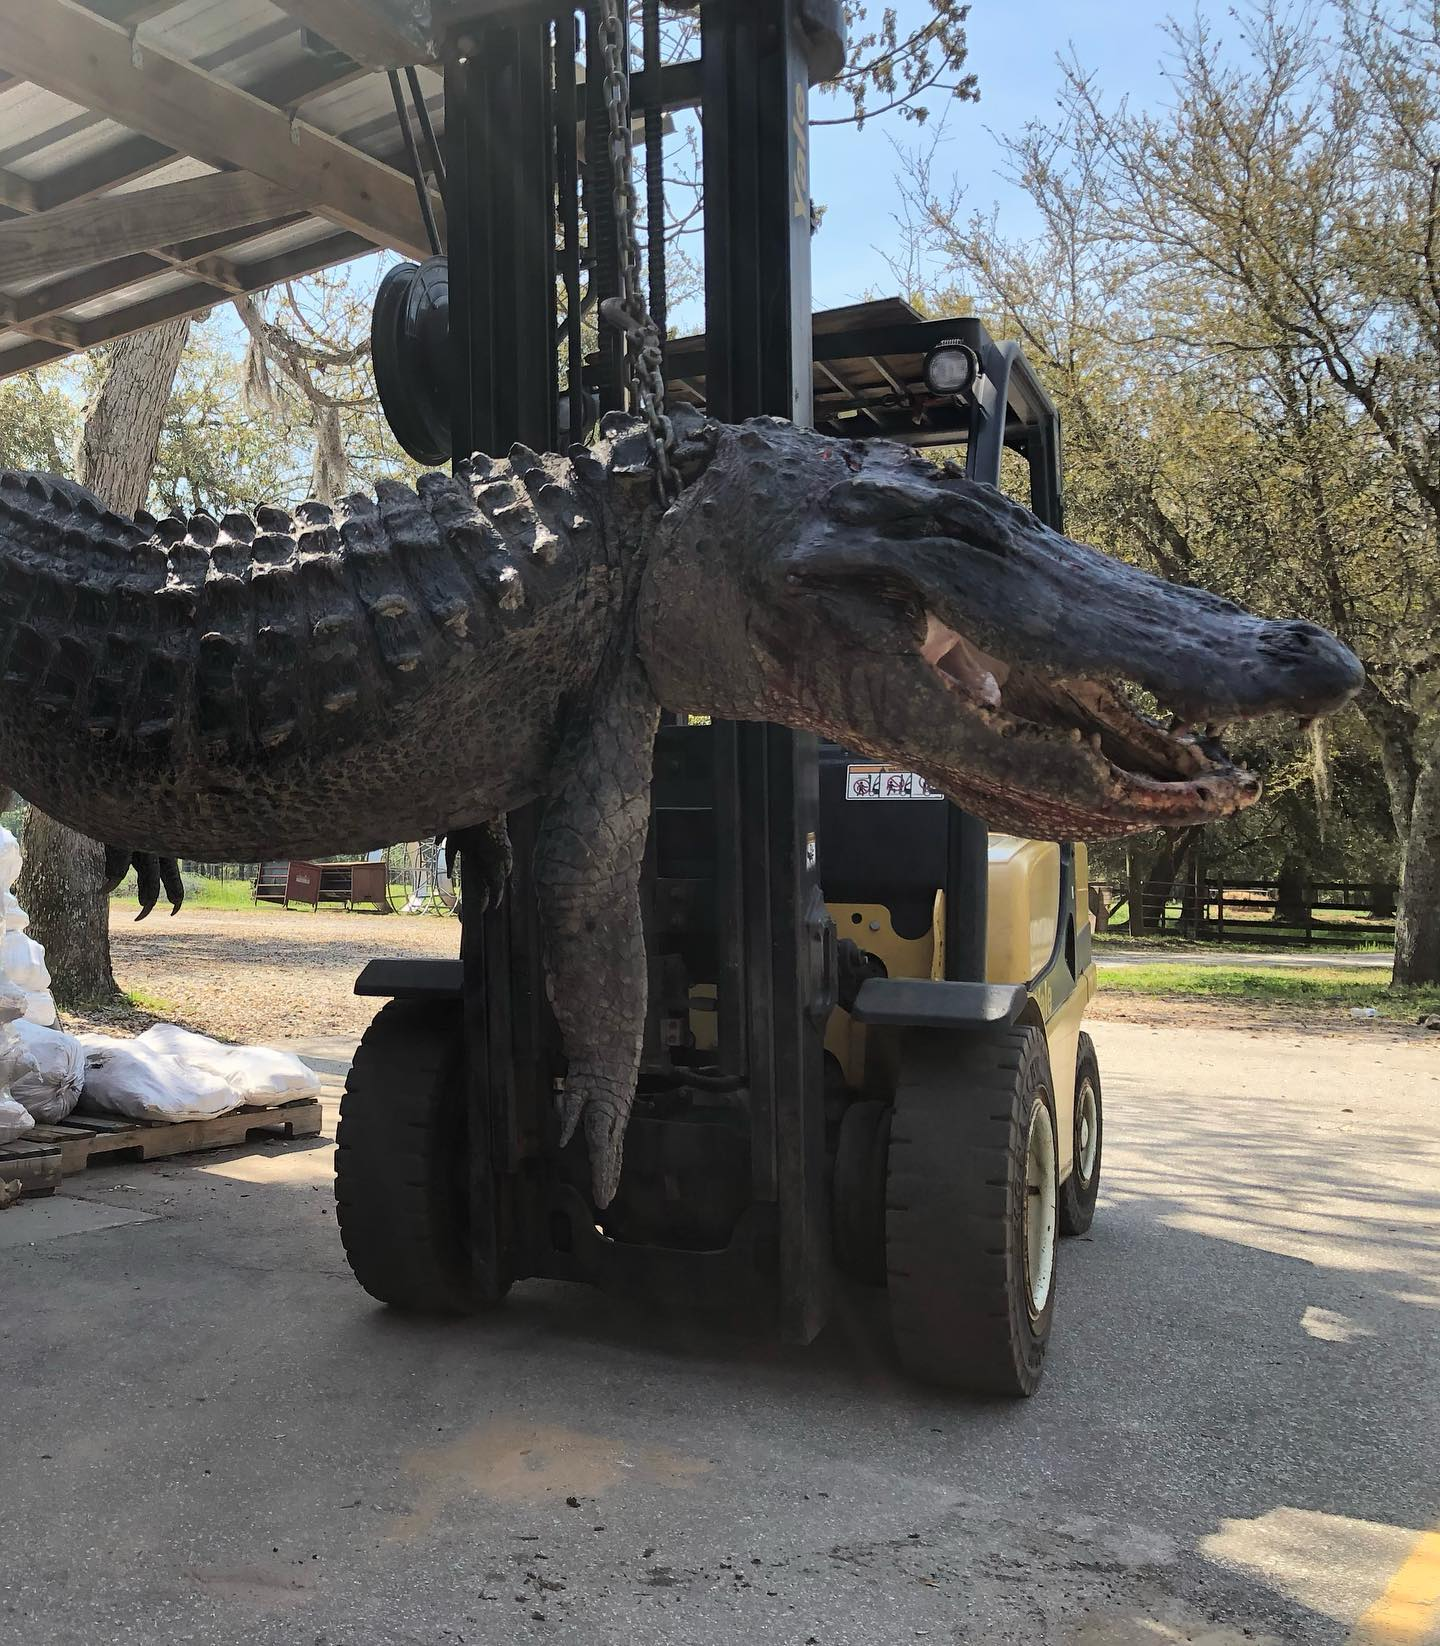 Dog-Eating Alligator Killed in South Carolina